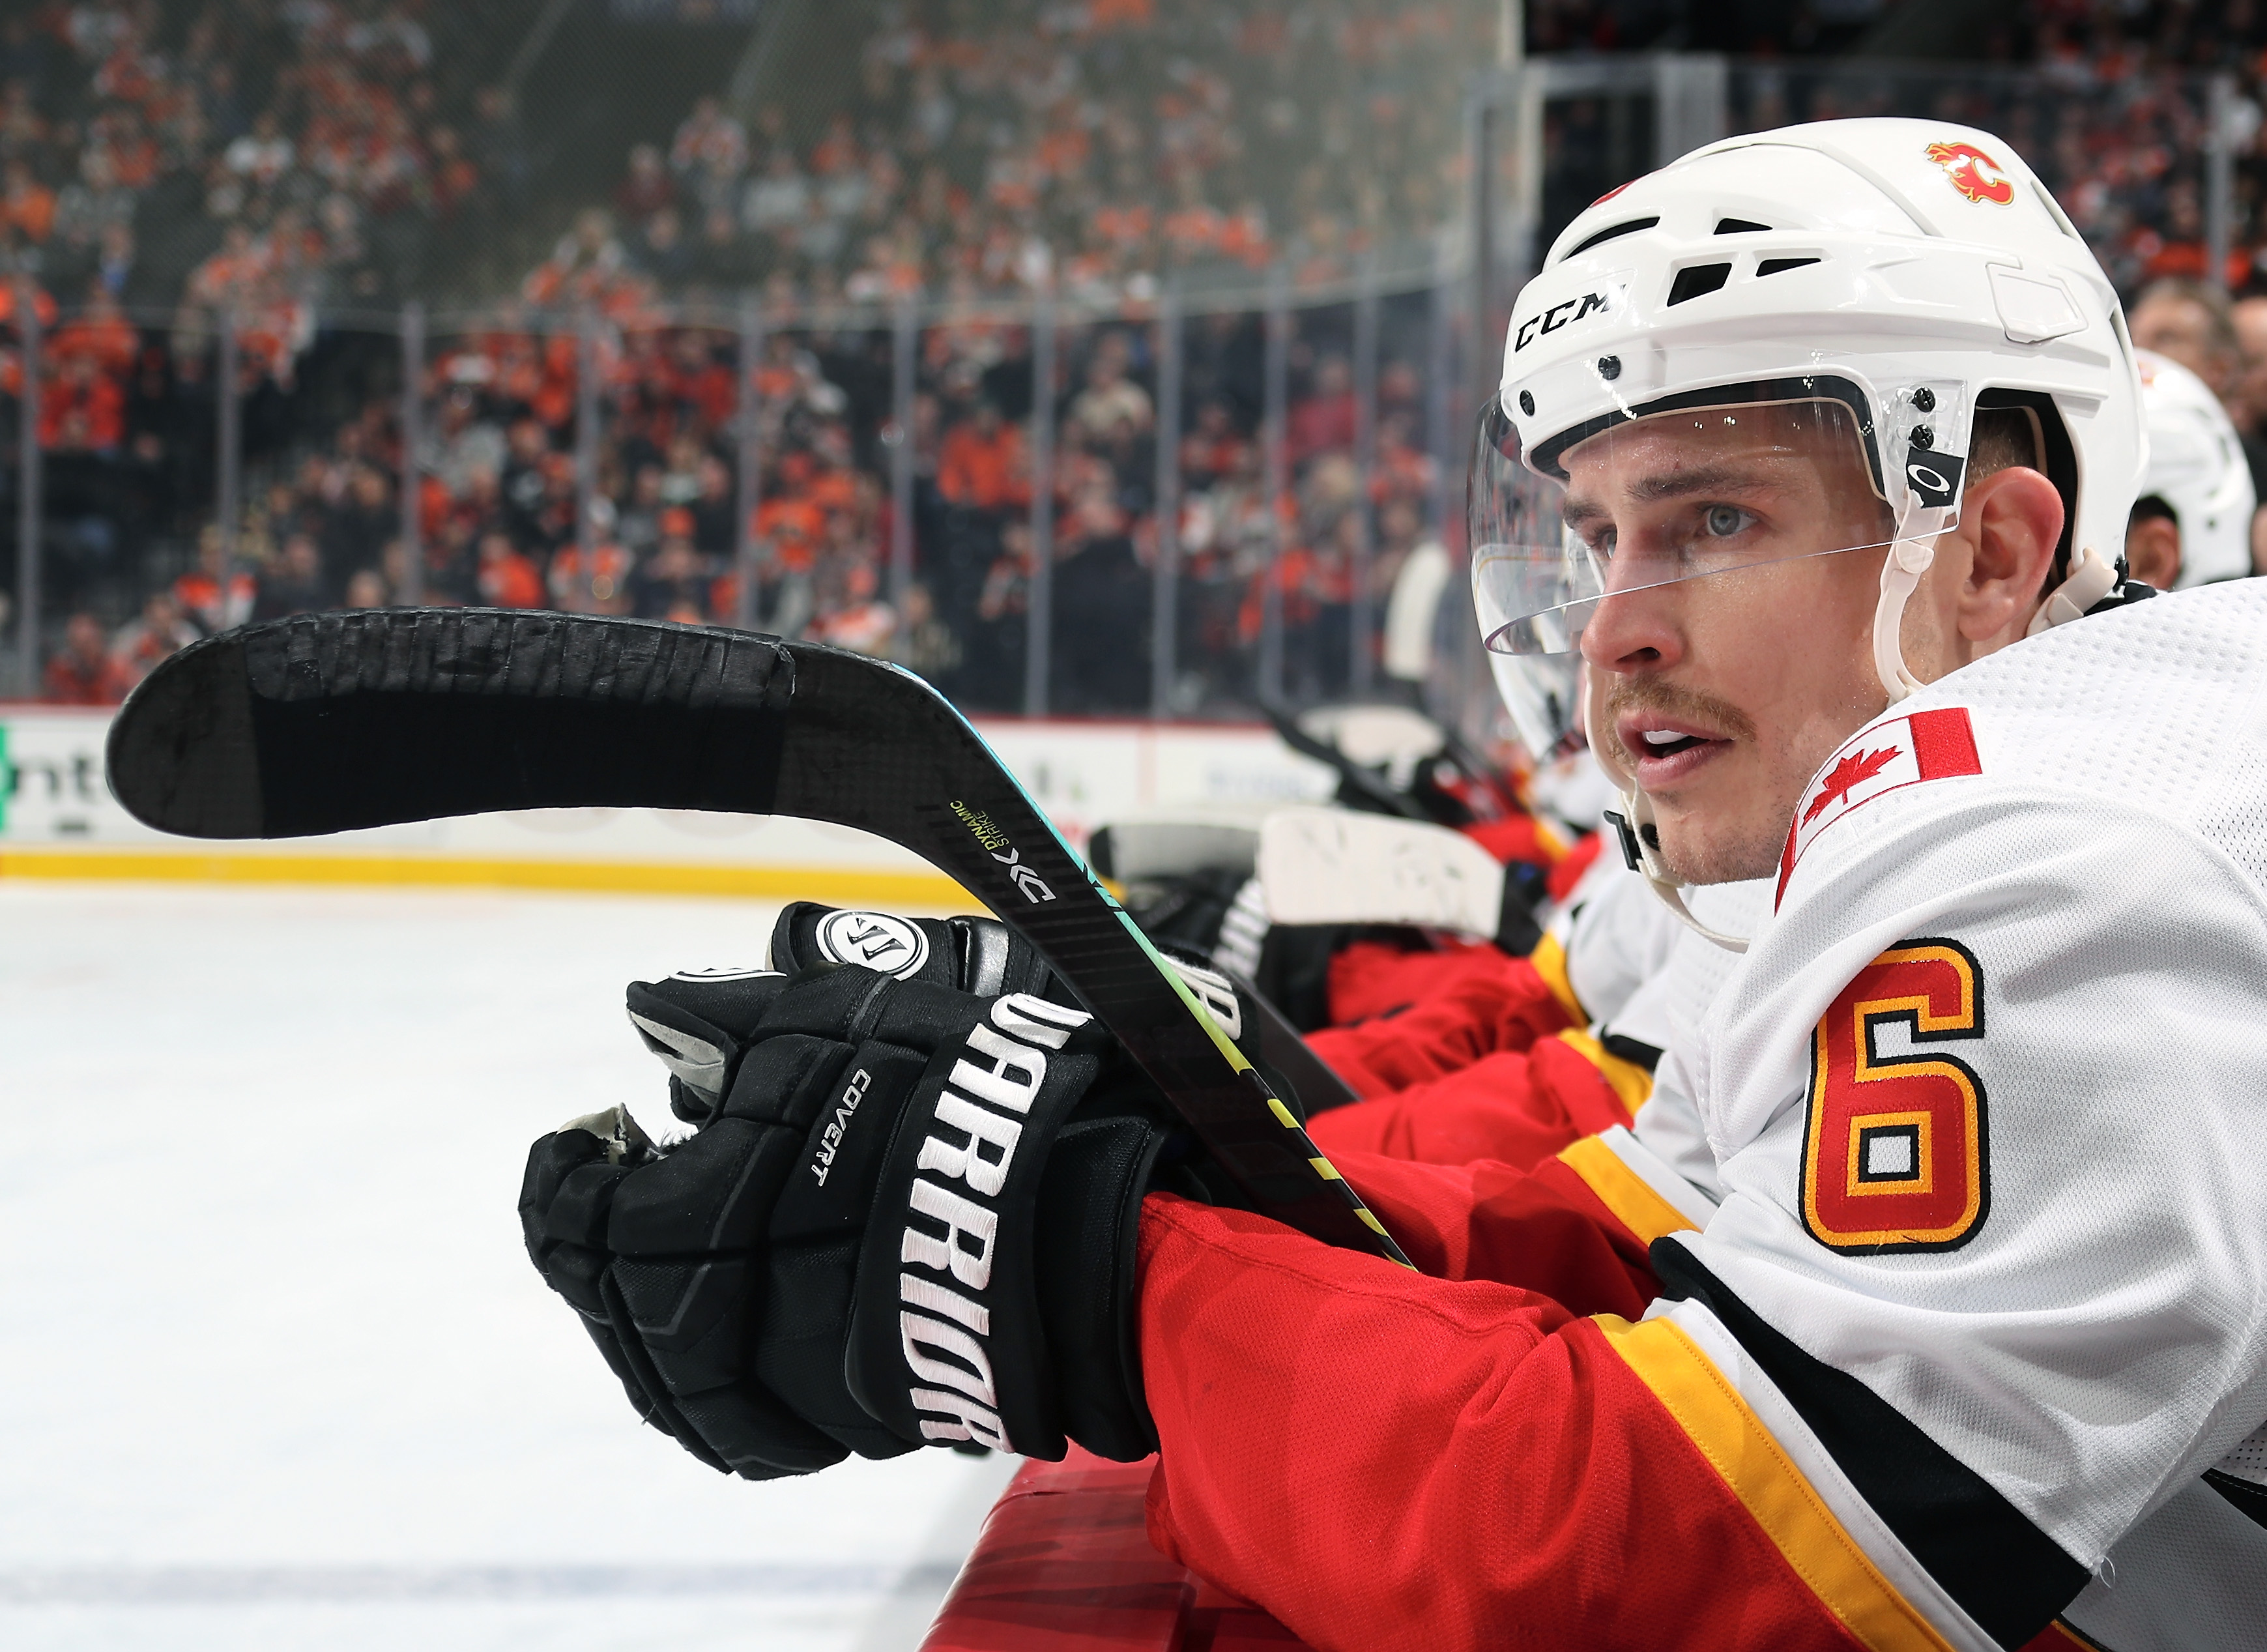 PHILADELPHIA, PA - NOVEMBER 23: Brandon Davidson #6 of the Calgary Flames watches a play develop on the ice against the Philadelphia Flyers on November 23, 2019 at the Wells Fargo Center in Philadelphia, Pennsylvania.